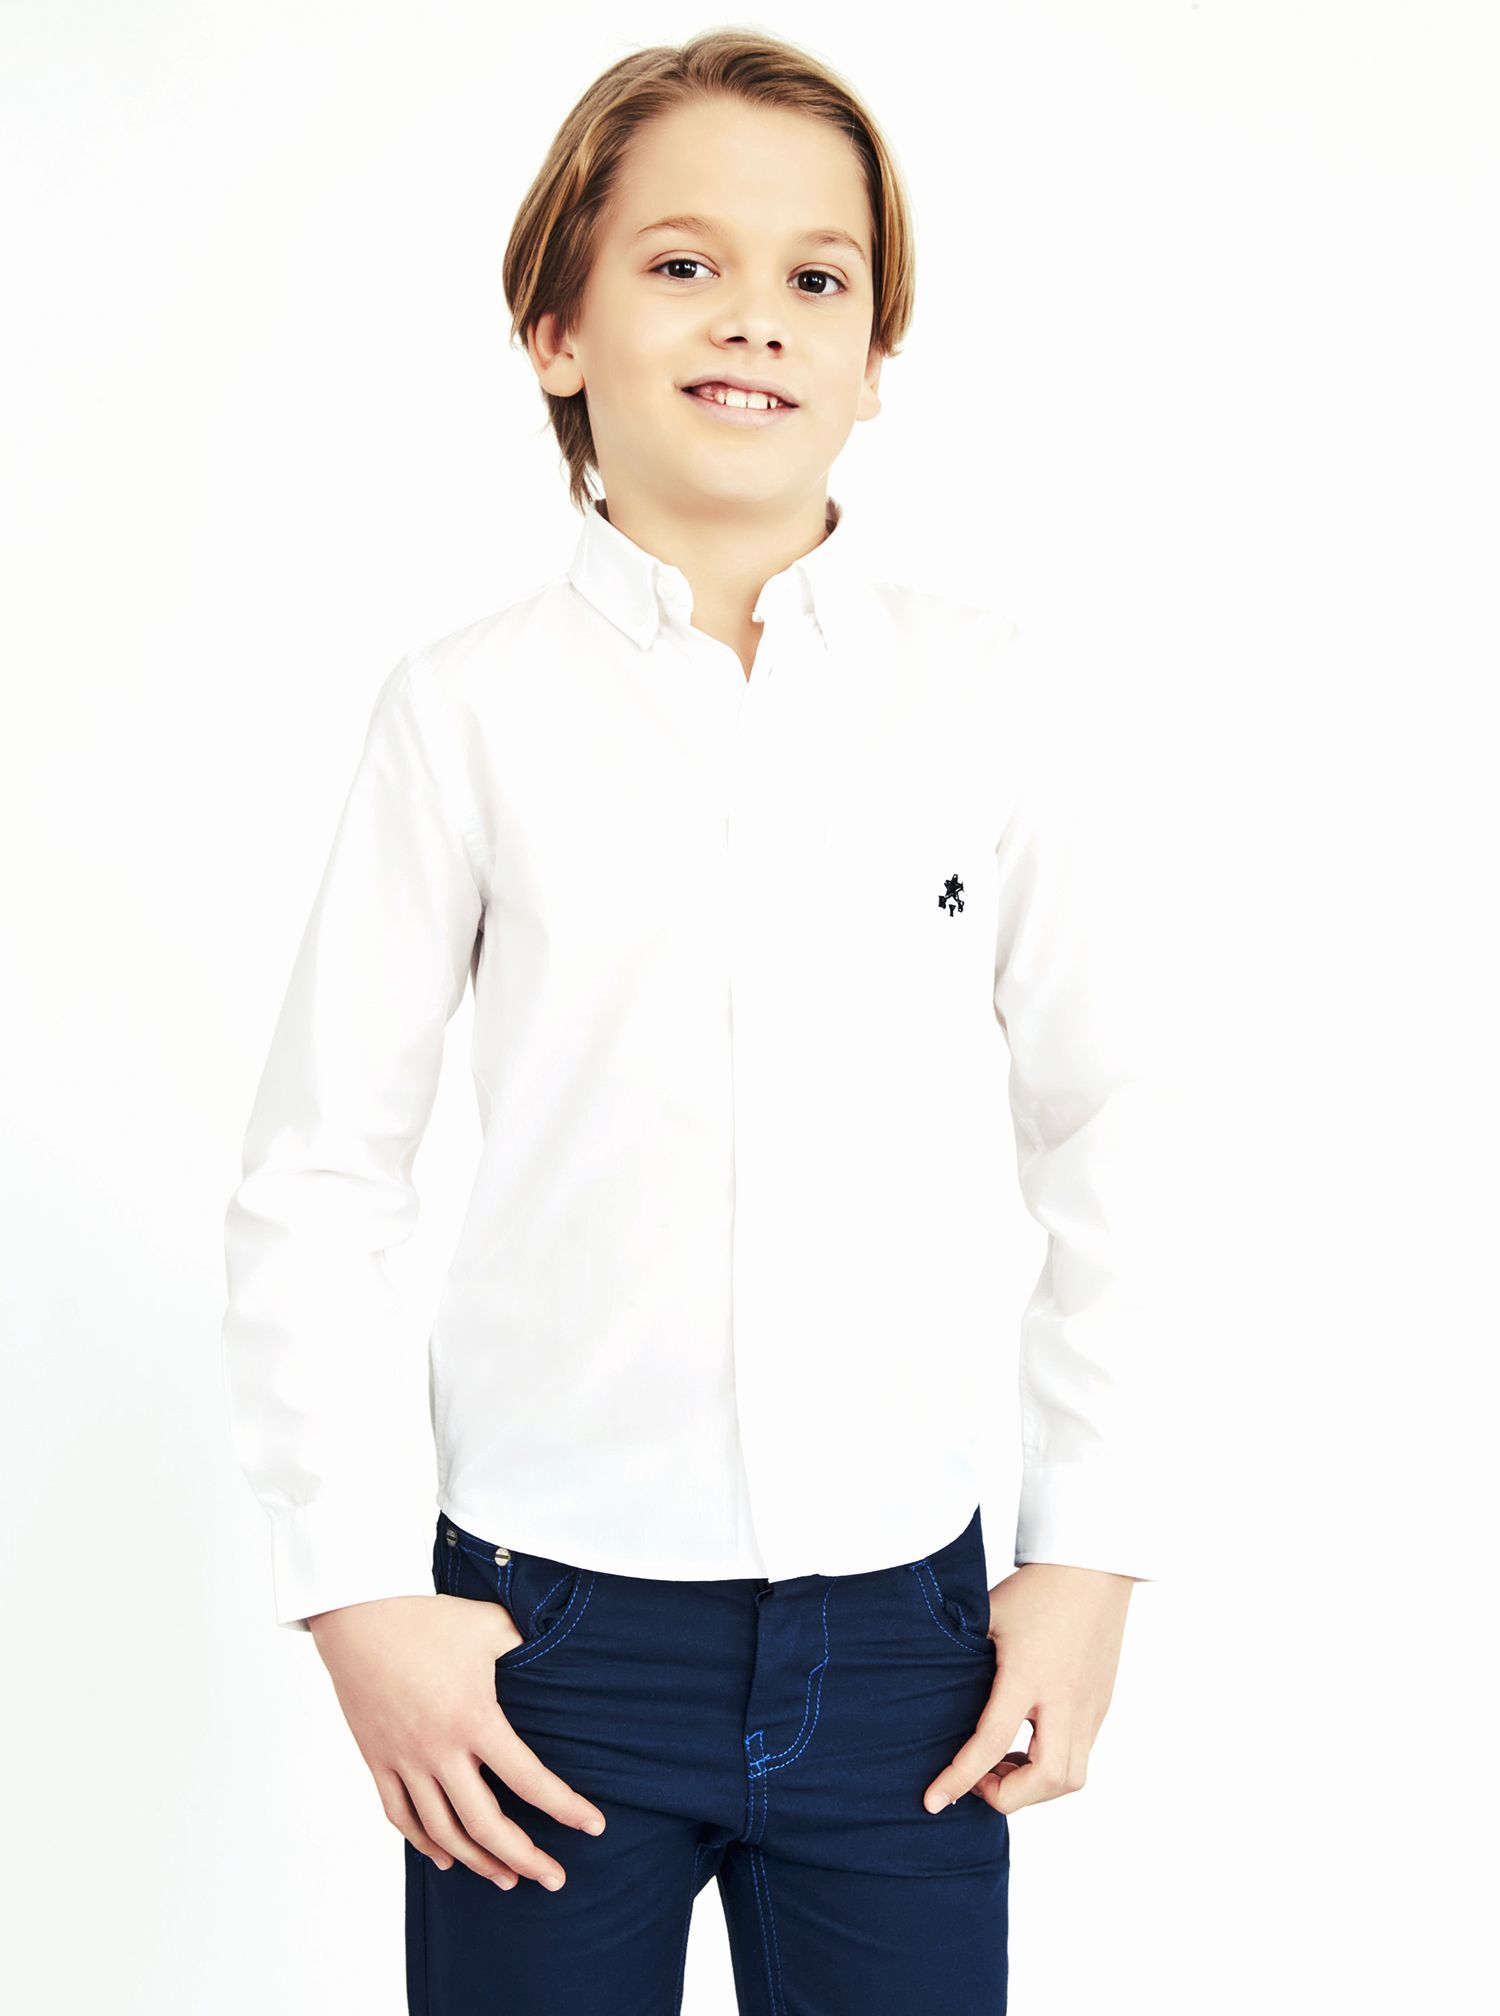 Camicia bambino slim fit   #kids #piazzaitalia #fashionkids #shirt #camicia #glam #wearepeople #pinterest #pinit